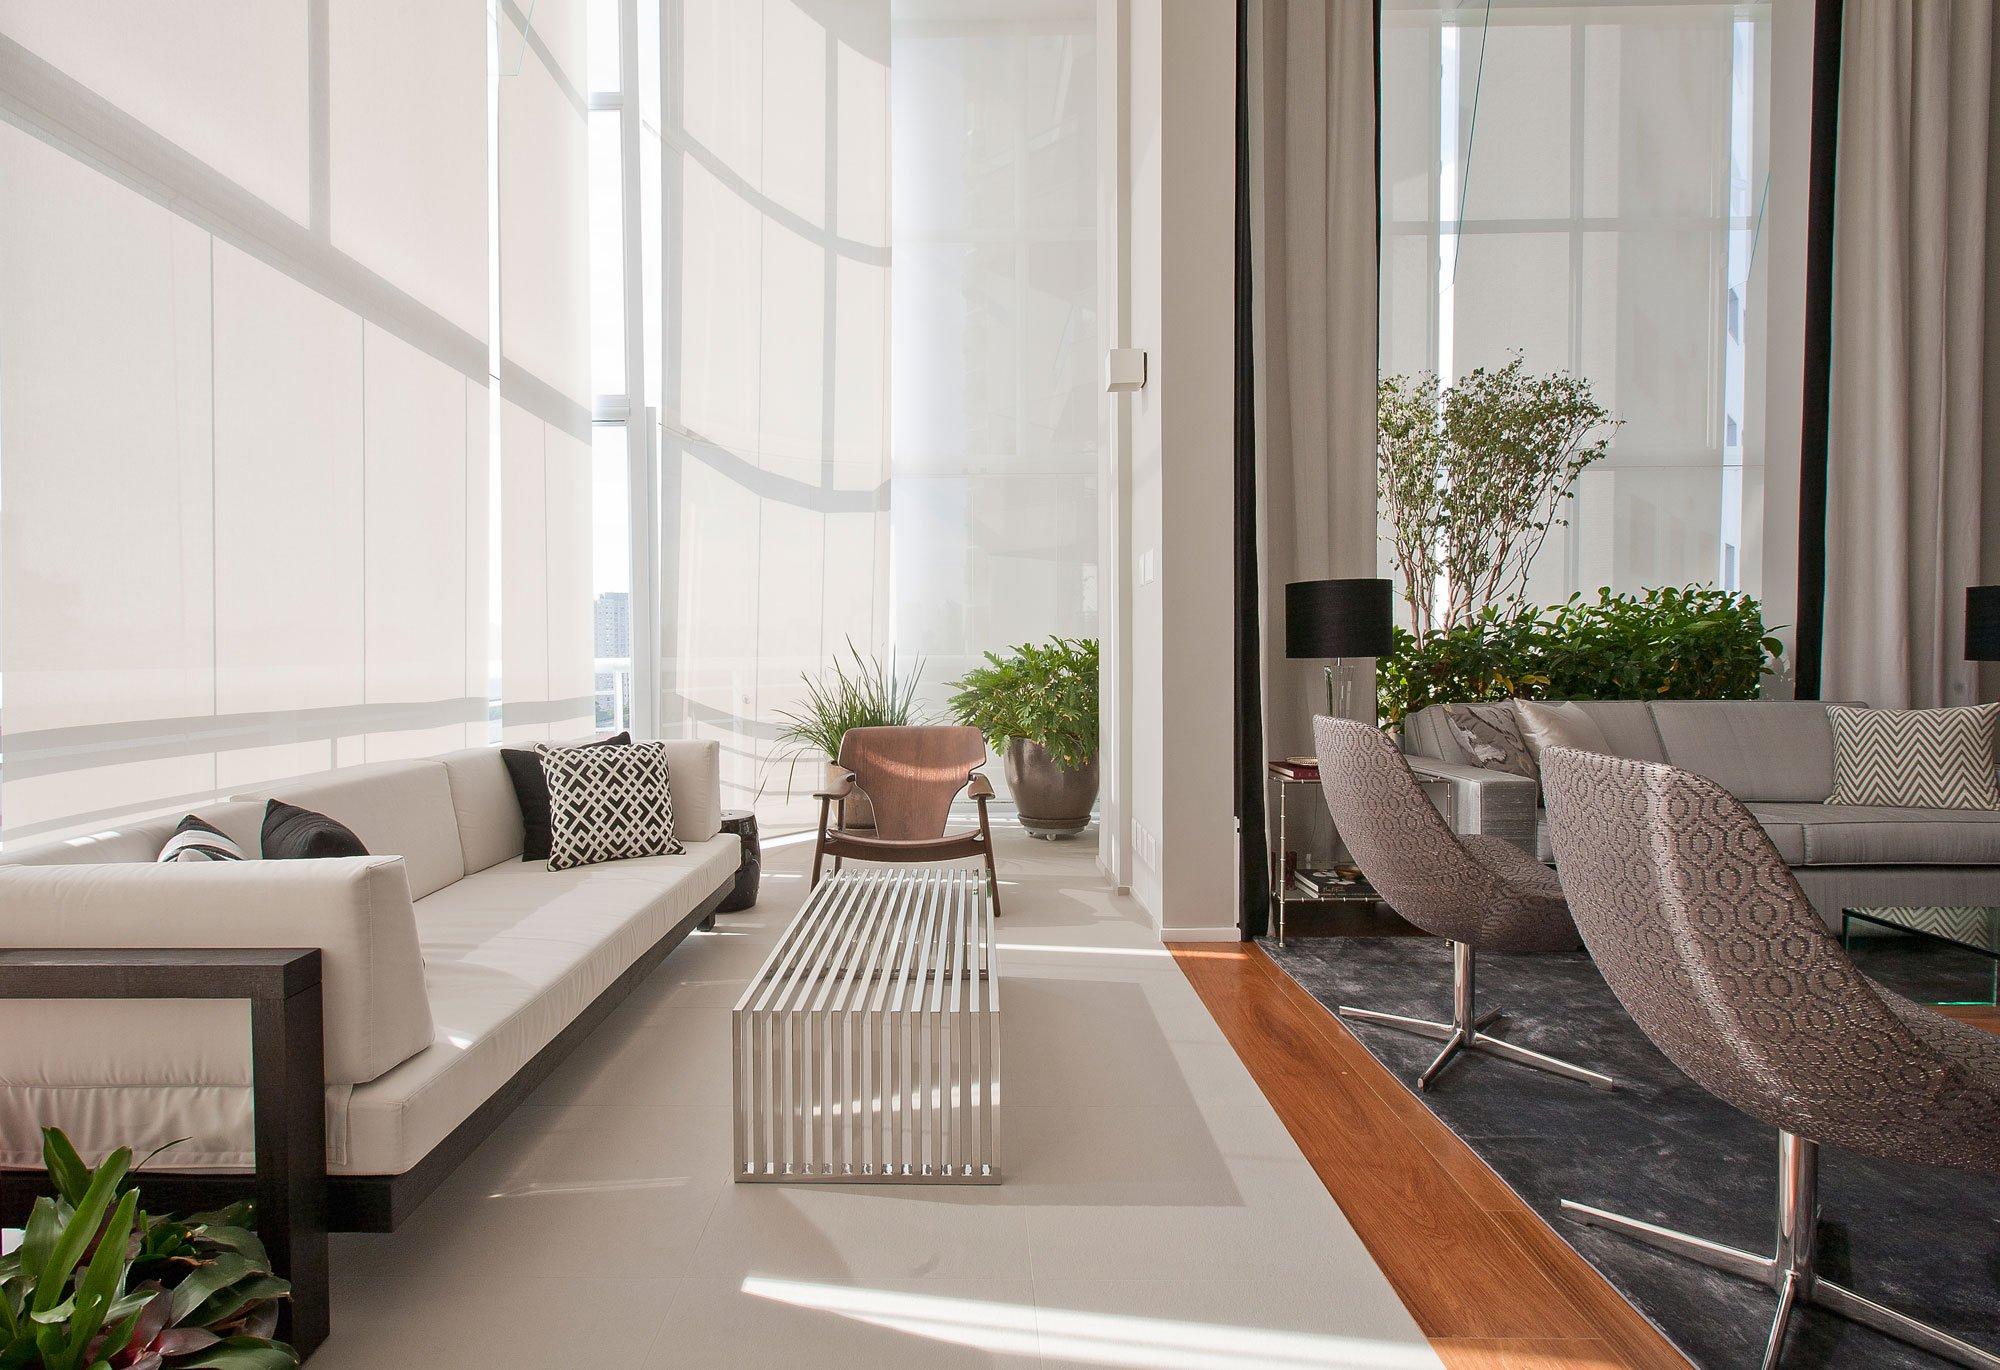 An-Elegant-Interior-13